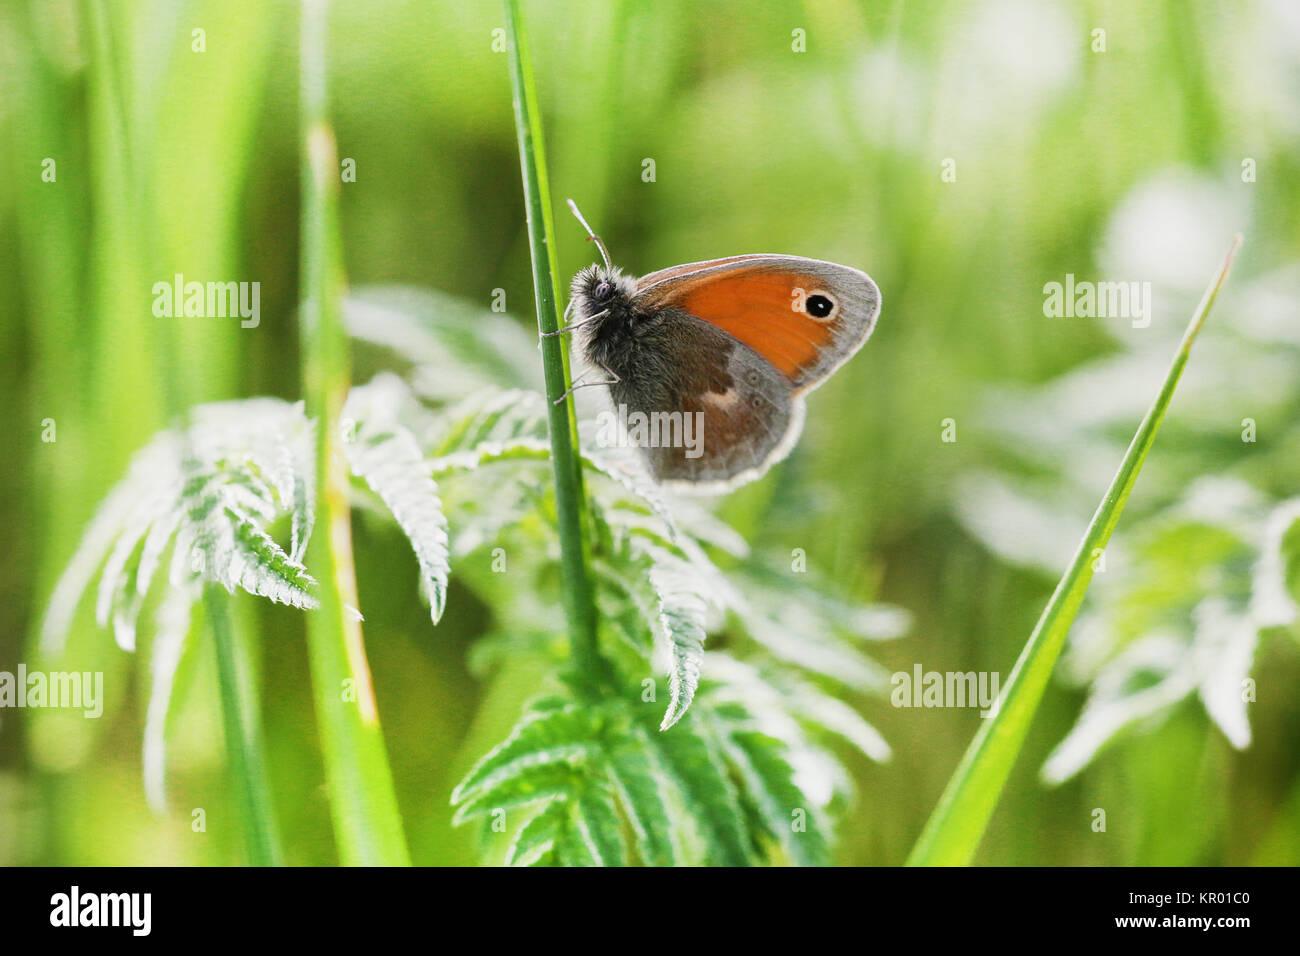 in macro jungle - Stock Image